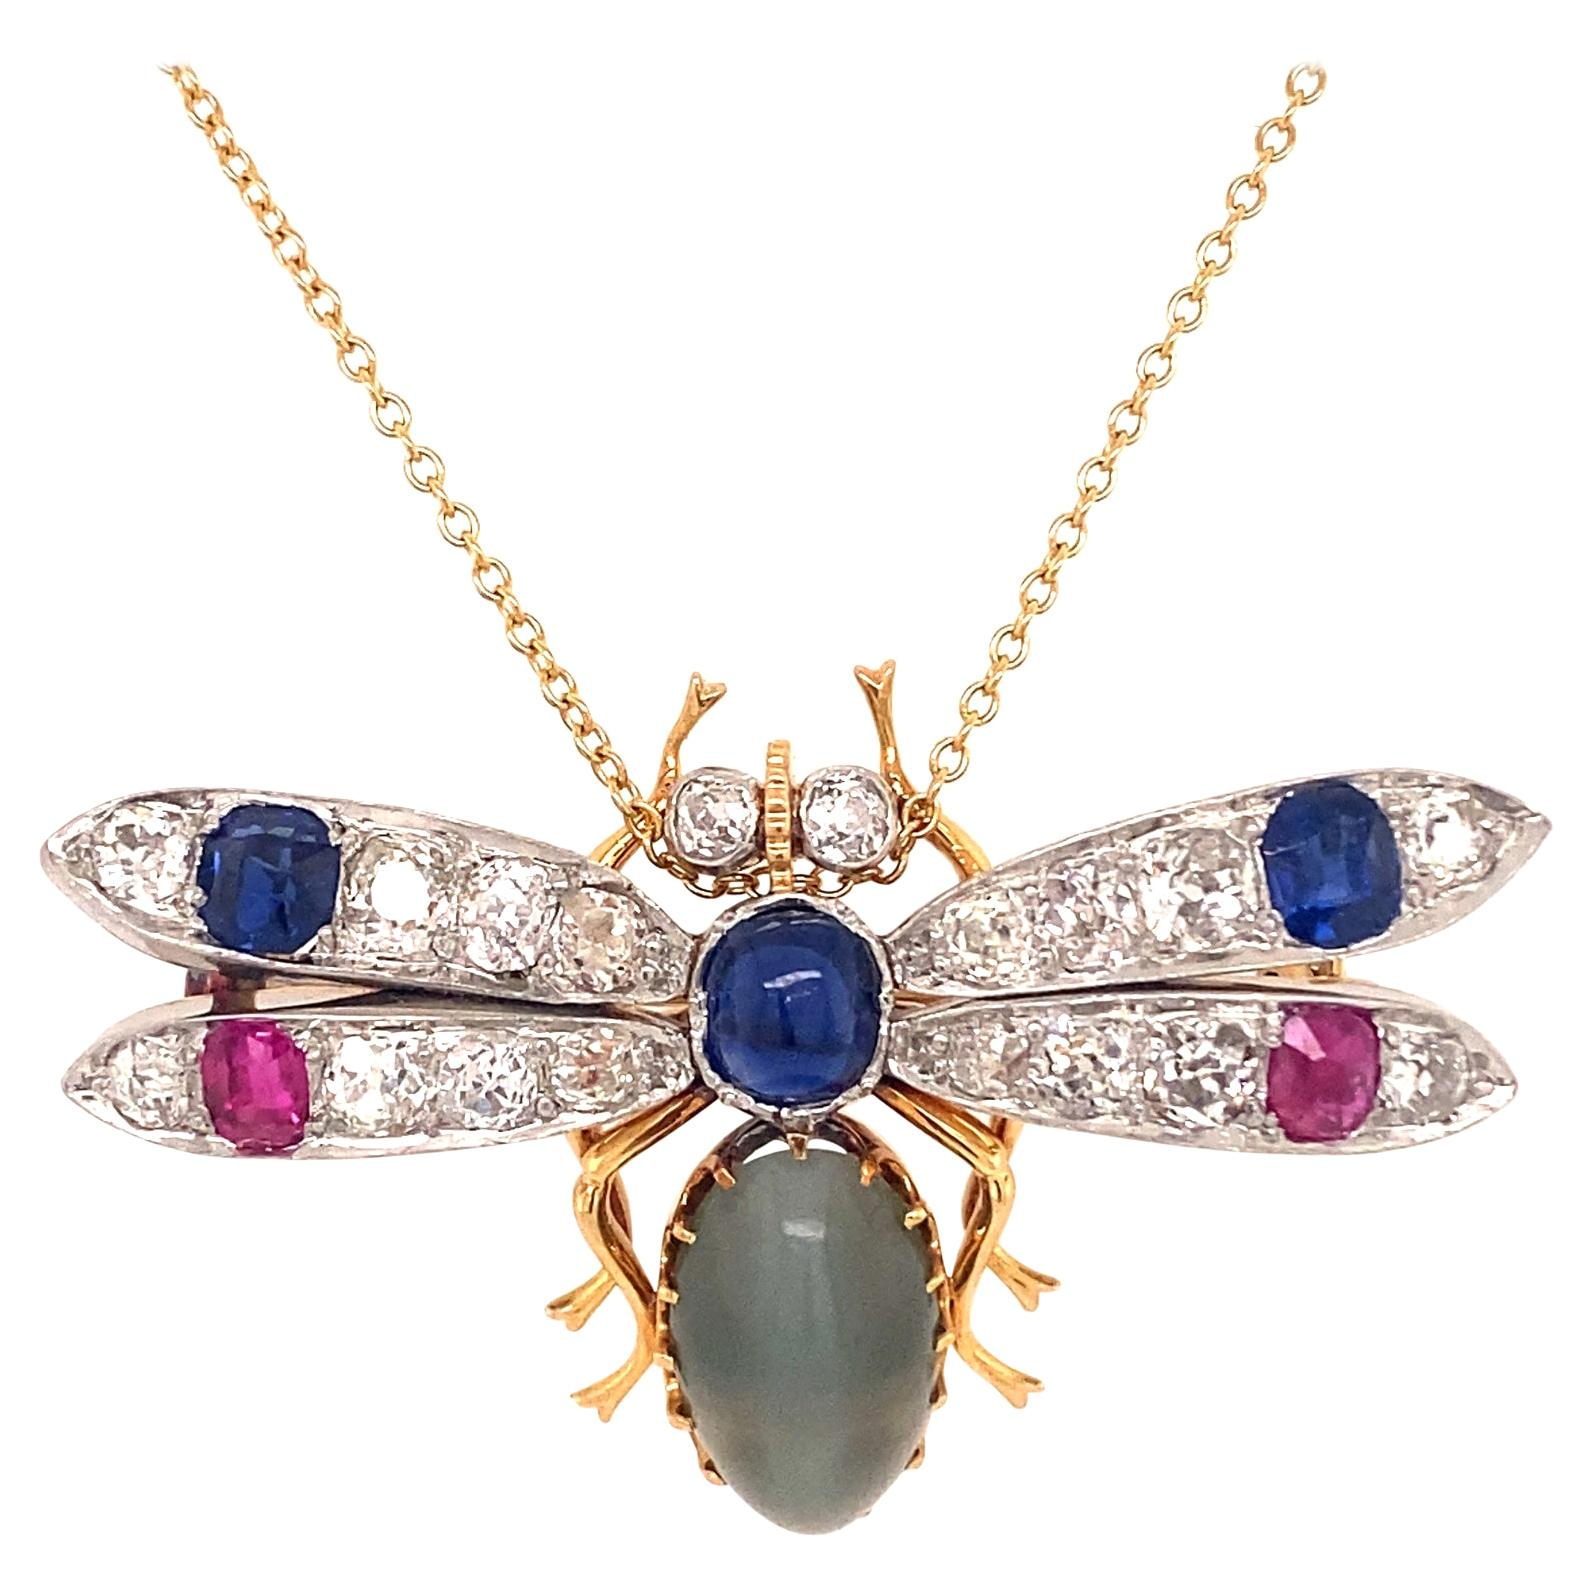 Antique 18K Gold Platinum Gem Cats Eye Diamonds Rubies Sapphires Insect Brooch